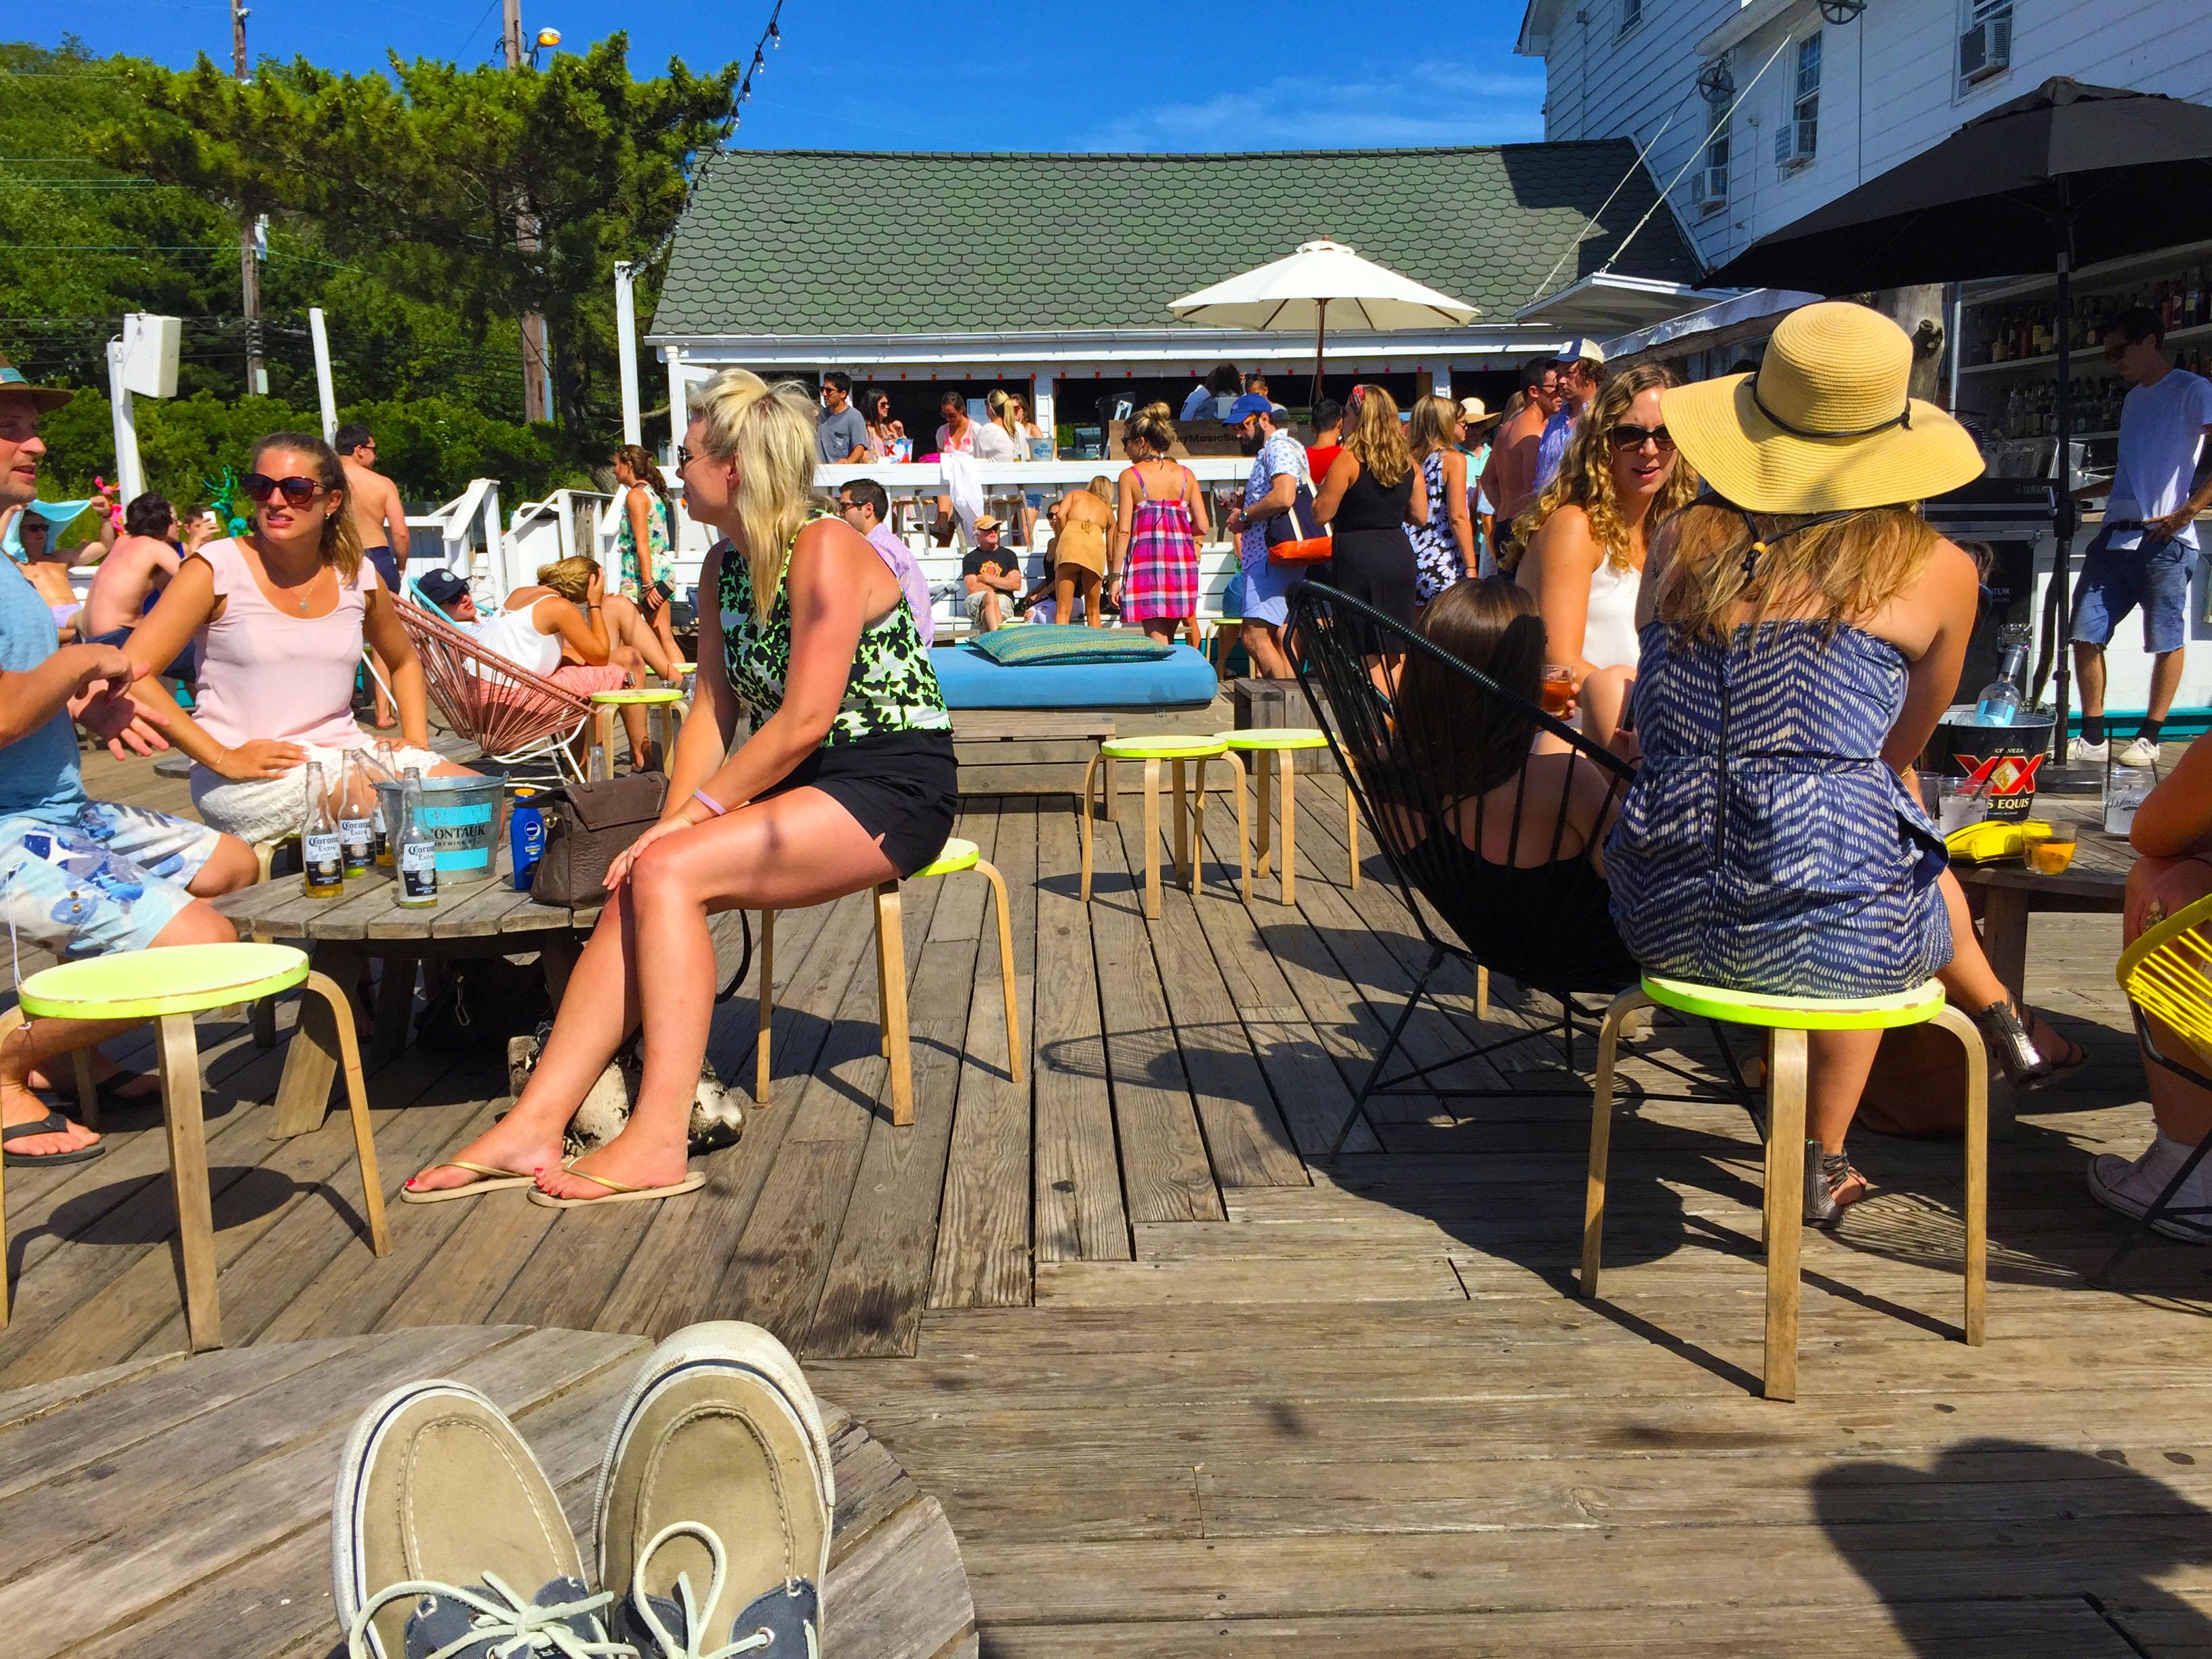 Montauk - Hamptons to Hollywood Lifestyle by Kyle Langan